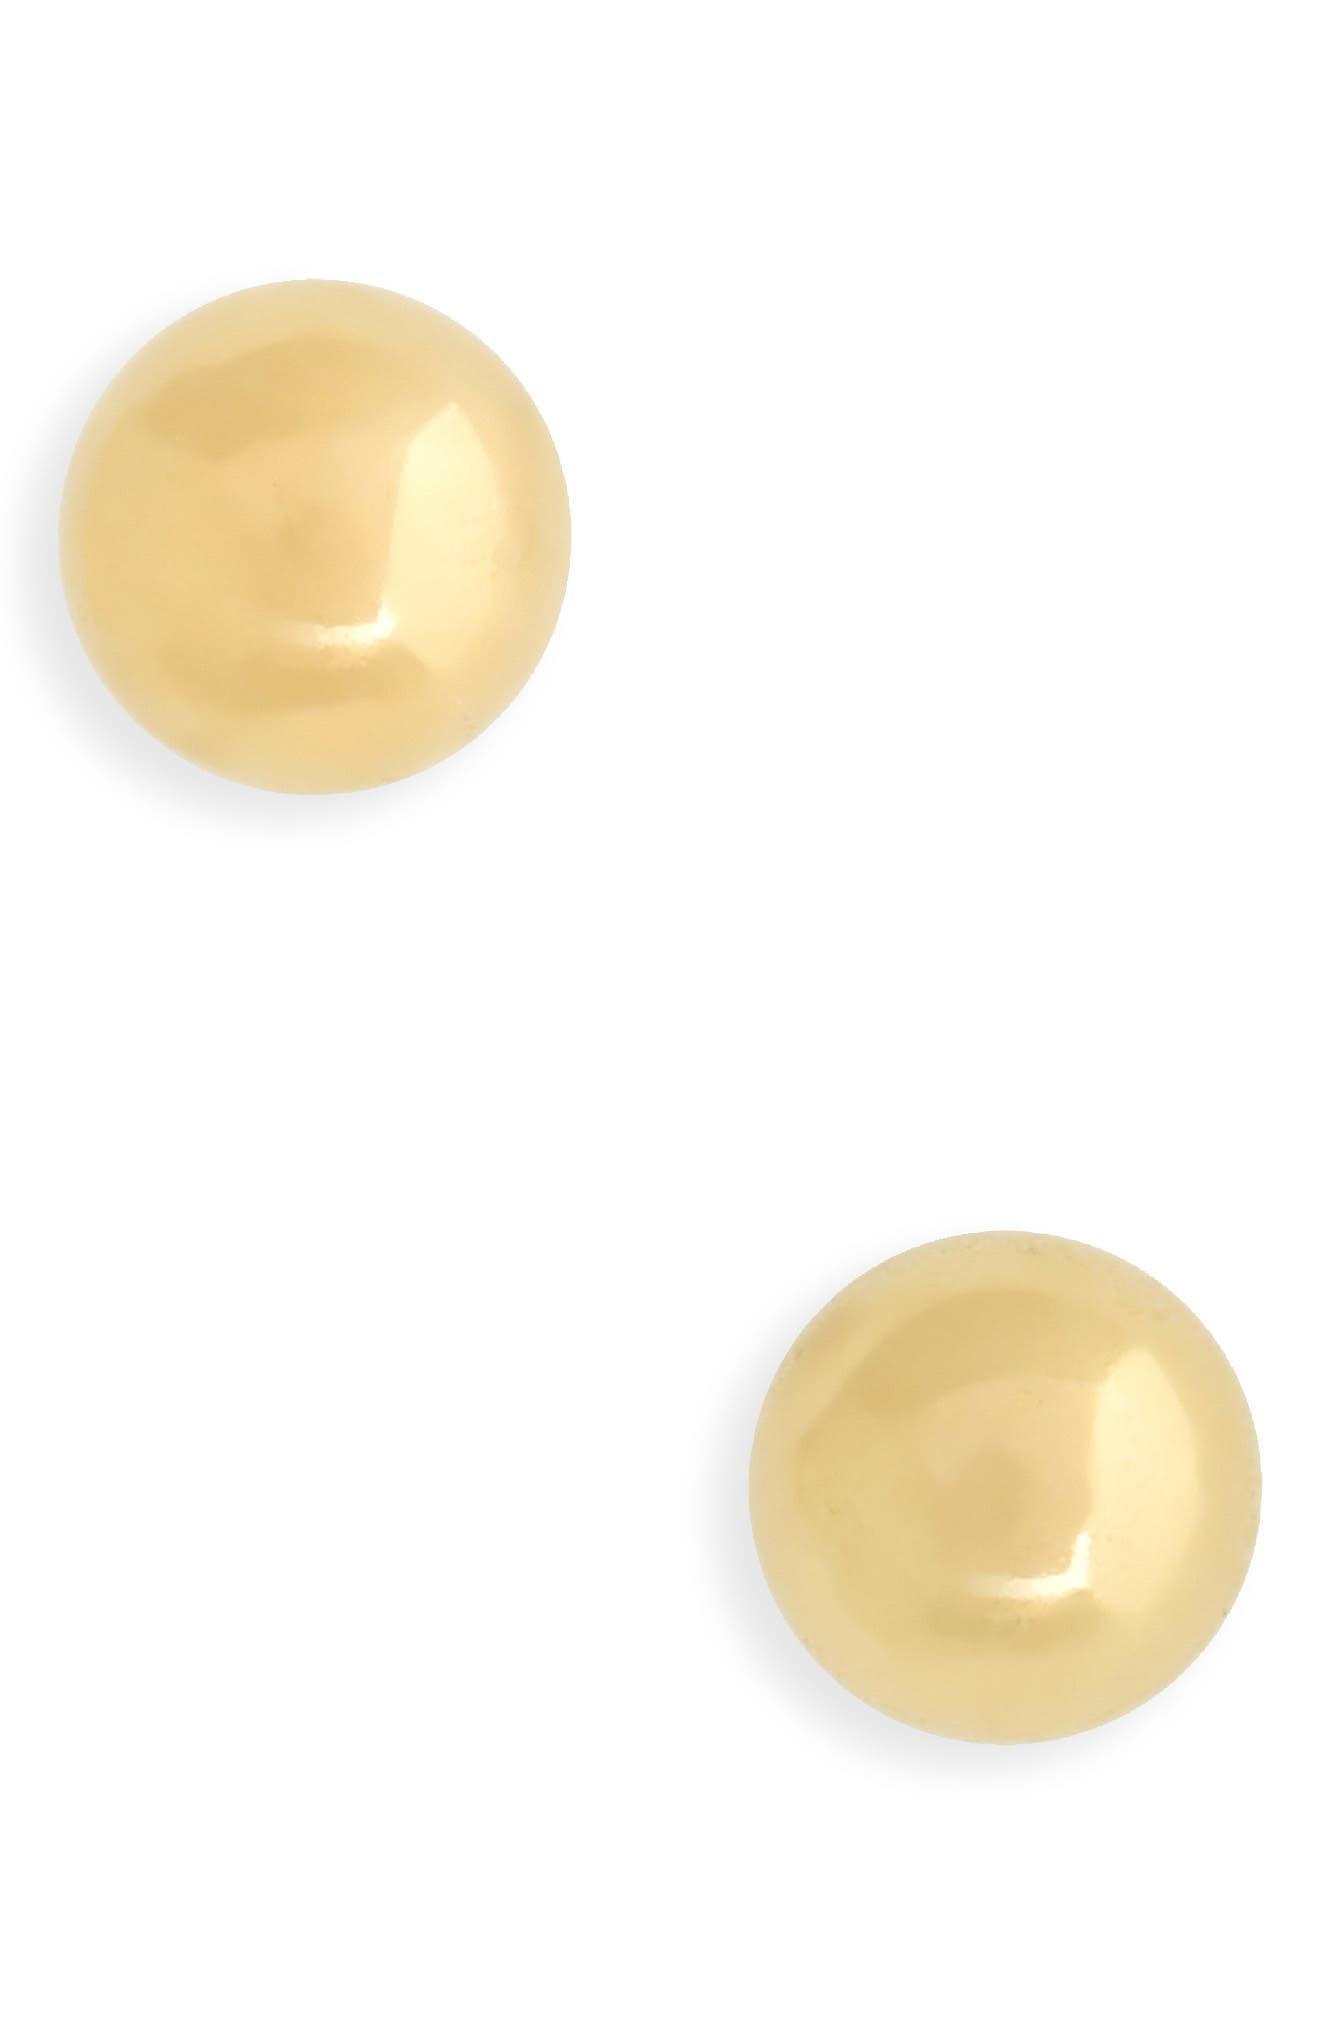 Kardee Kids 14k Gold Ball Earrings,                         Main,                         color, Gold